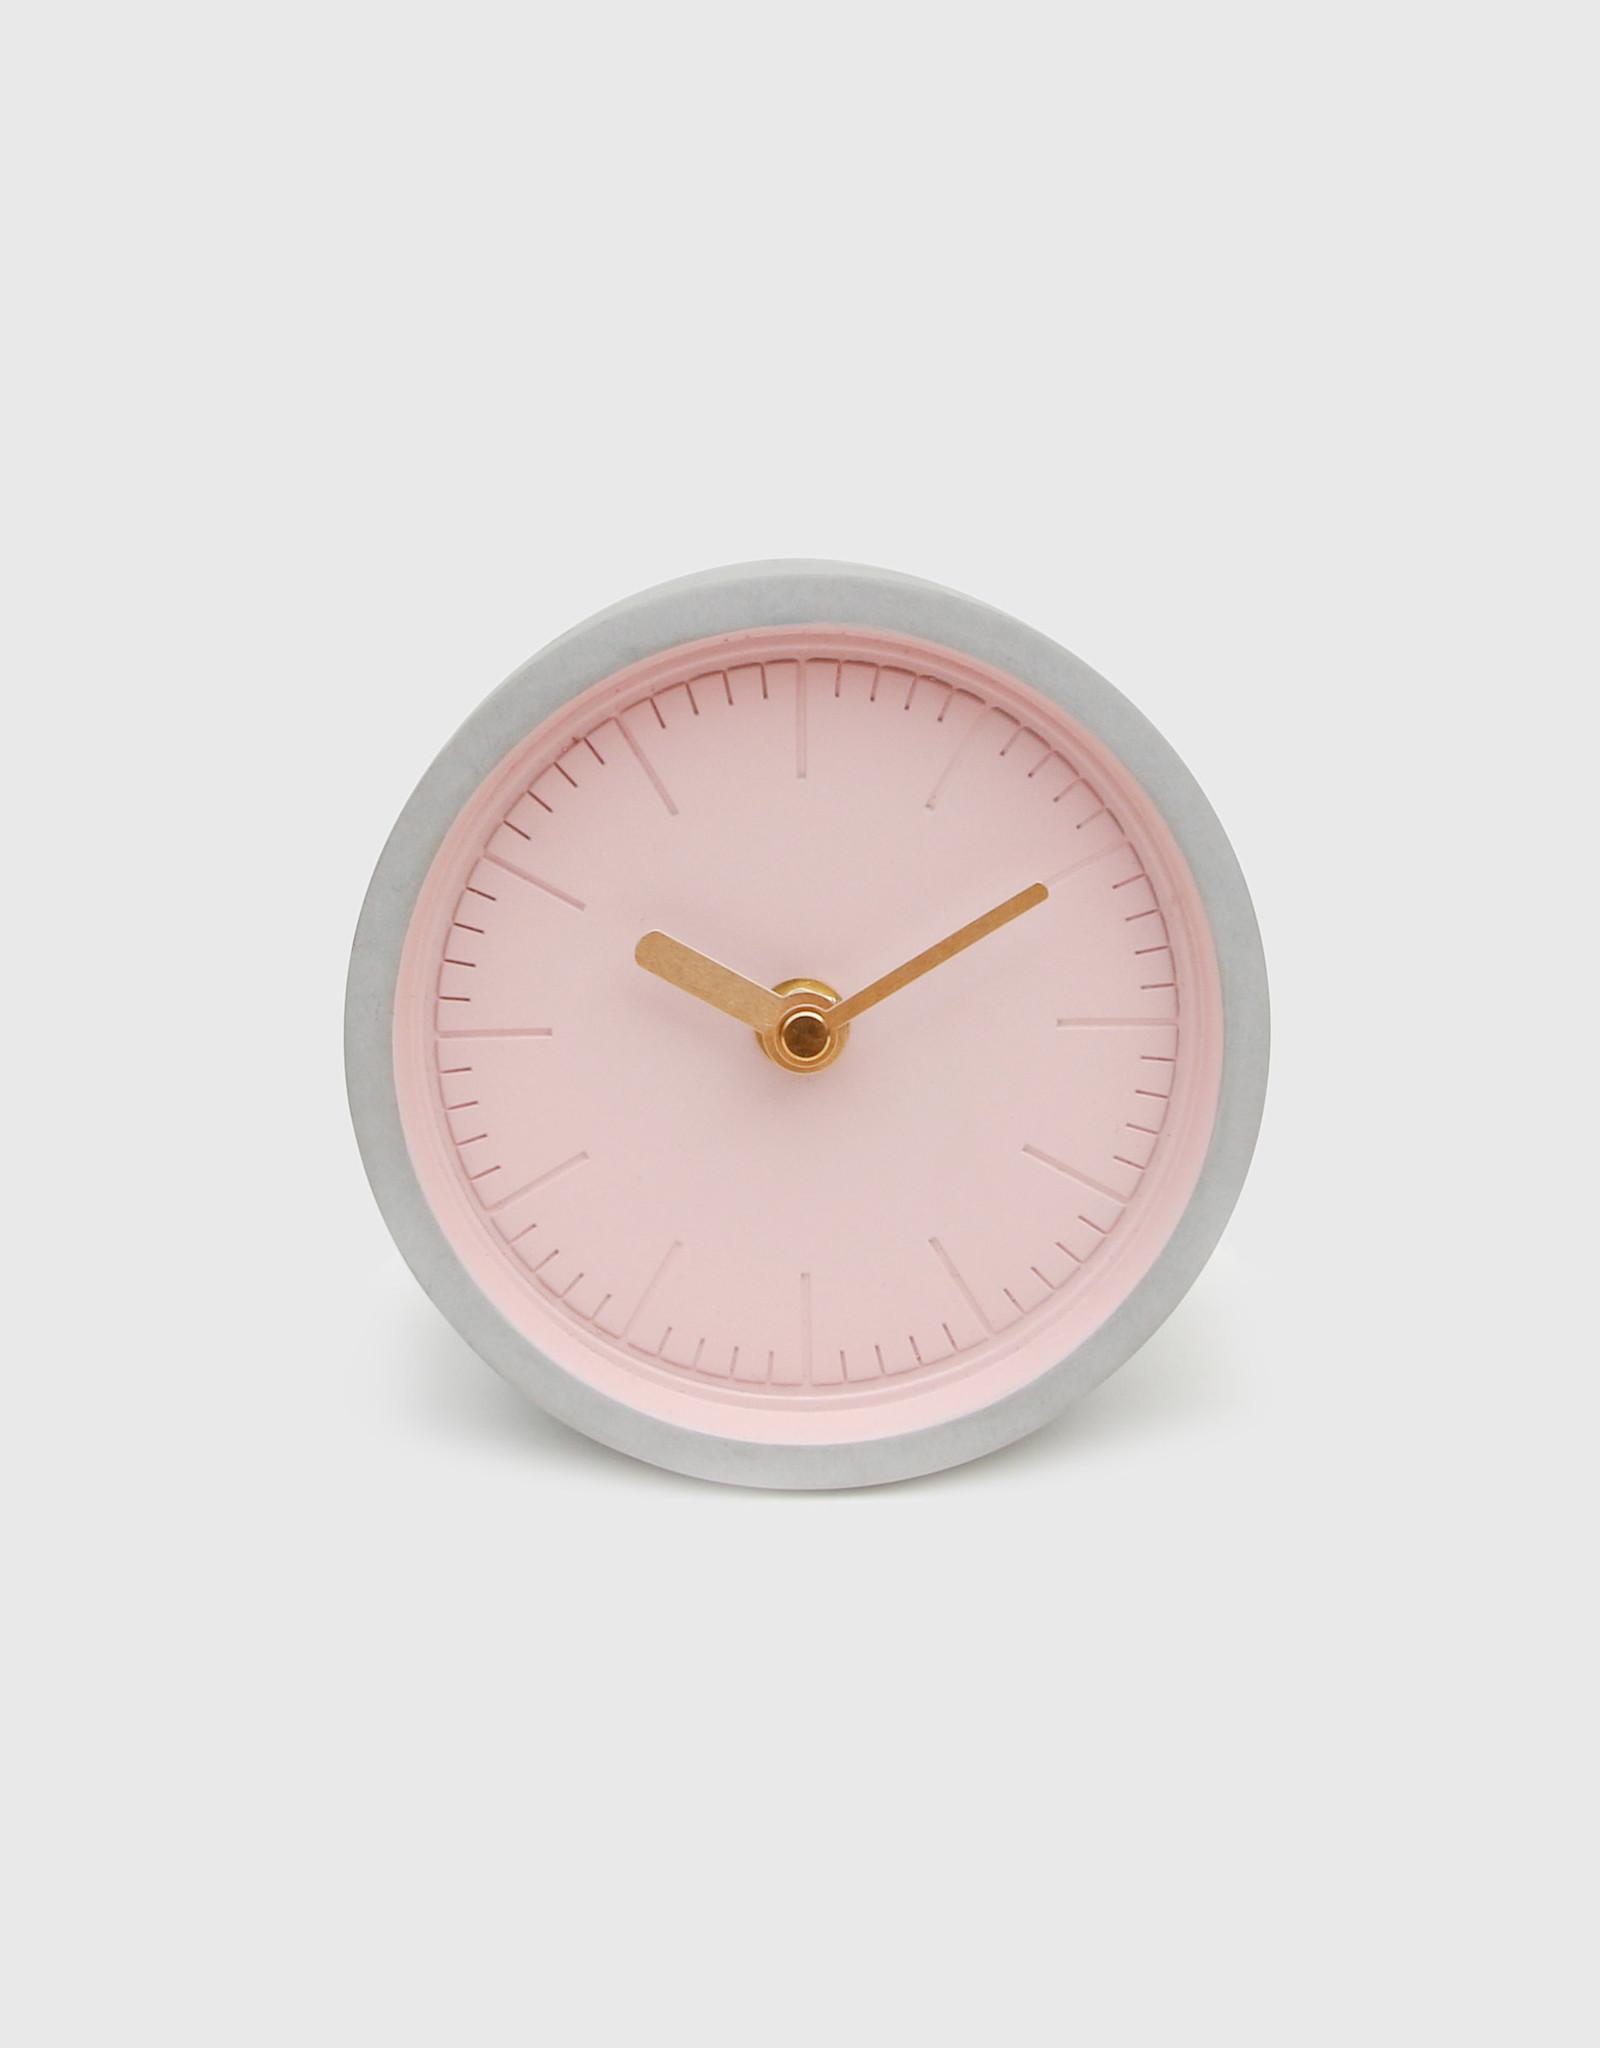 Suck UK Clock - Desk pink concrete